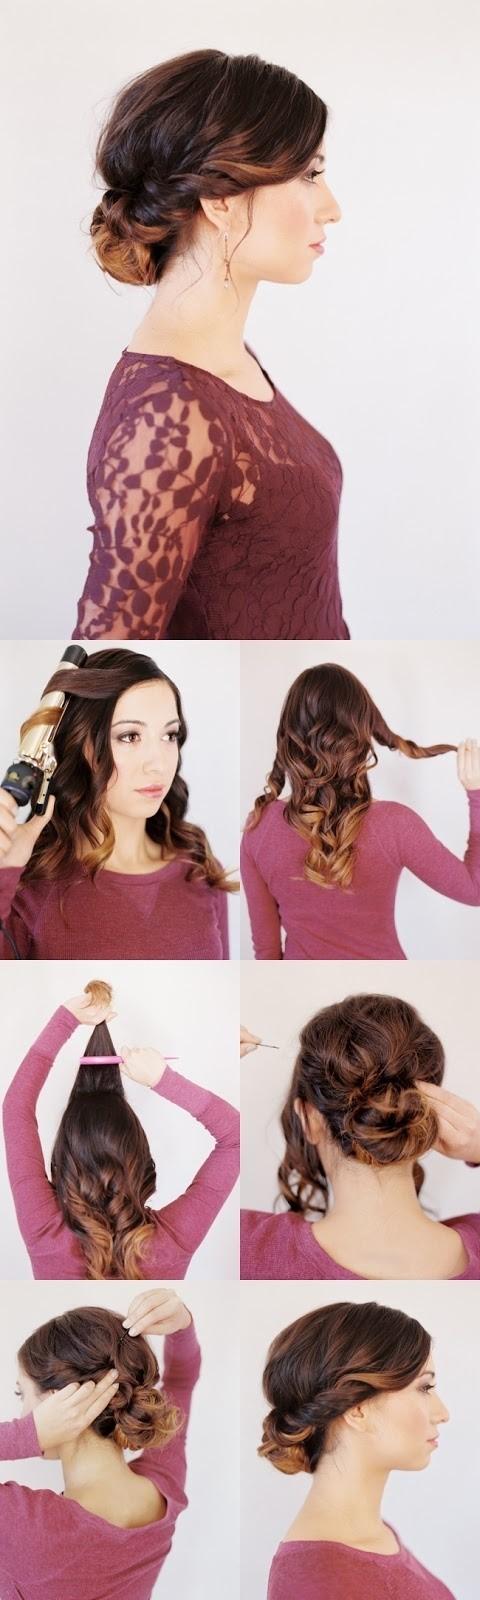 12 Trendy Low Bun Updo Hairstyles Tutorials: Easy Cute - PoPular Haircuts